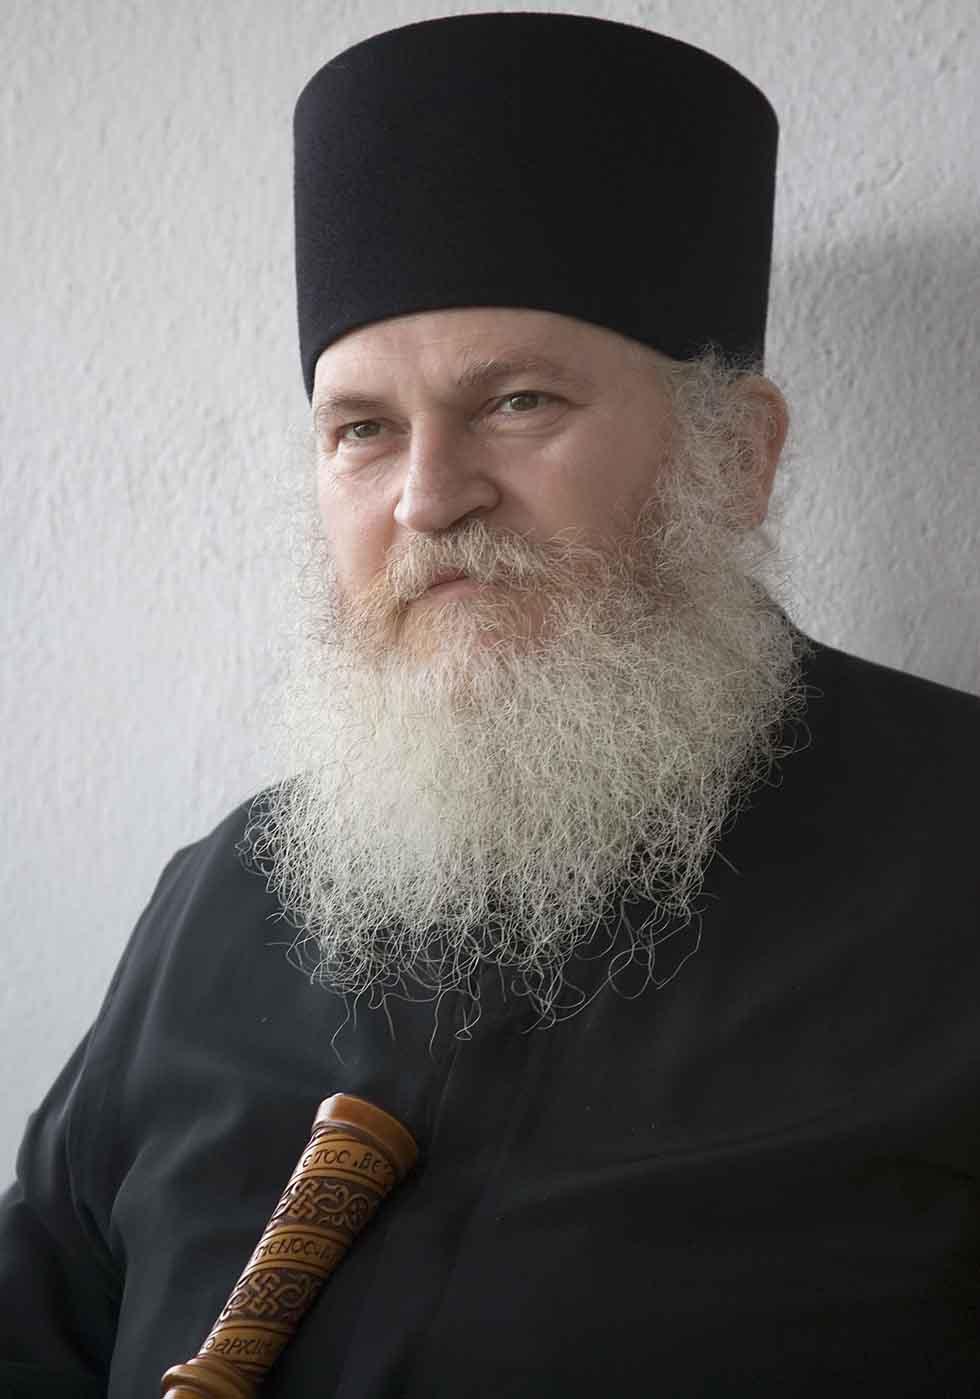 Read more about the article ΕΚΤΑΚΤΟ: Κρίσιμα τα επόμενα 24ωρα για τον γέροντα Εφραίμ – Επιδεινώθηκε η υγεία του